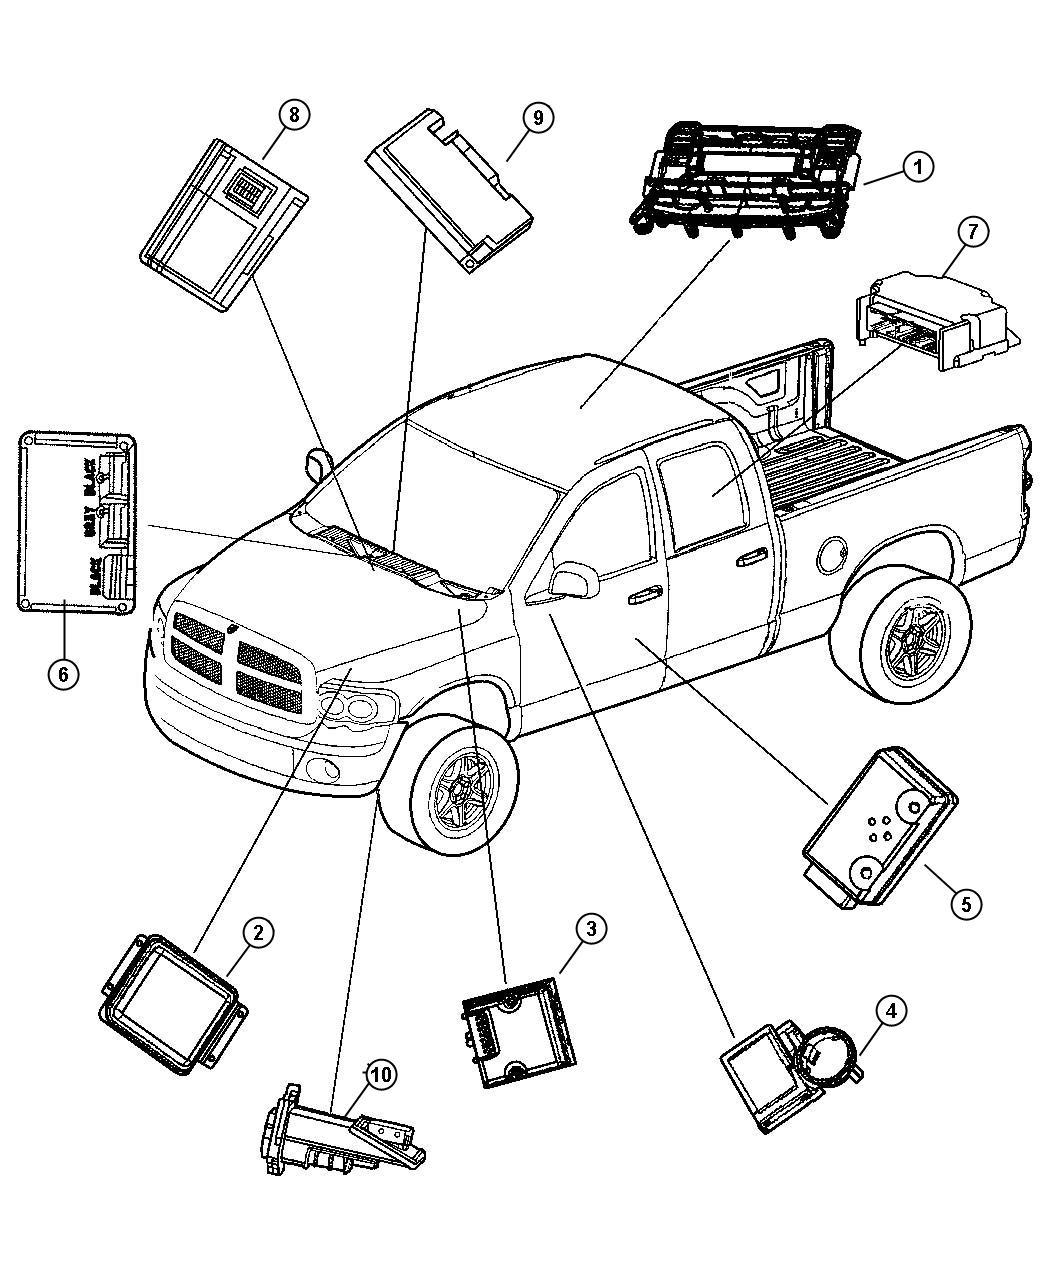 2005 Dodge Ram 3500 Module. Immobilizer. Sentry, key